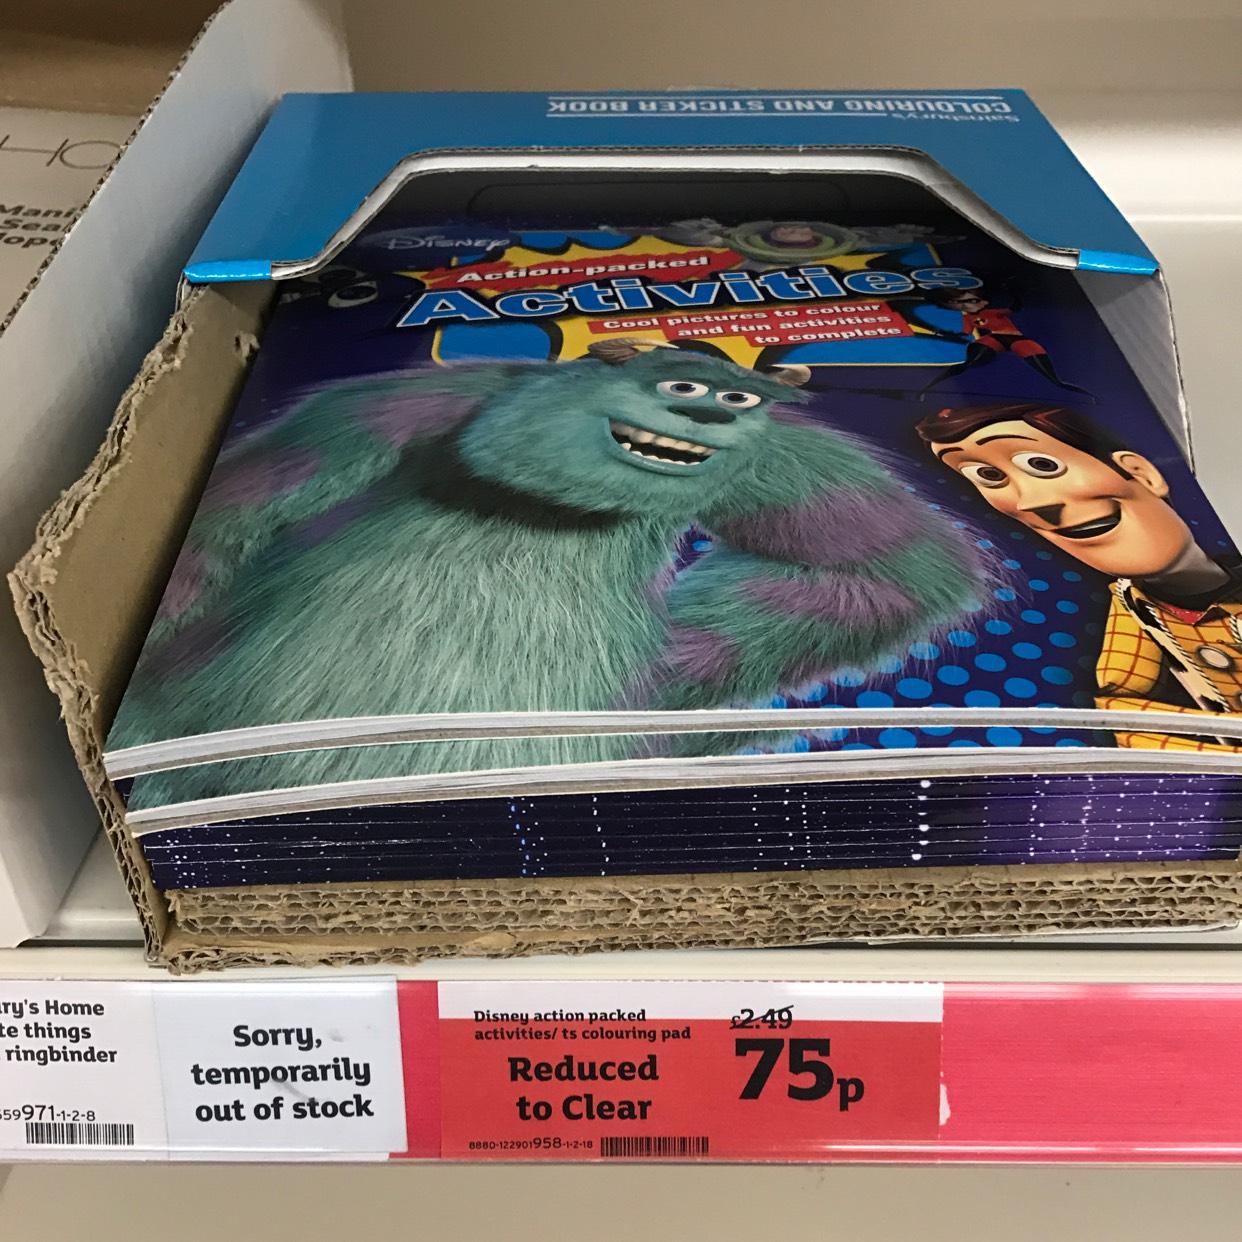 Disney activity books 75p @ Sainsbury's - Haringey